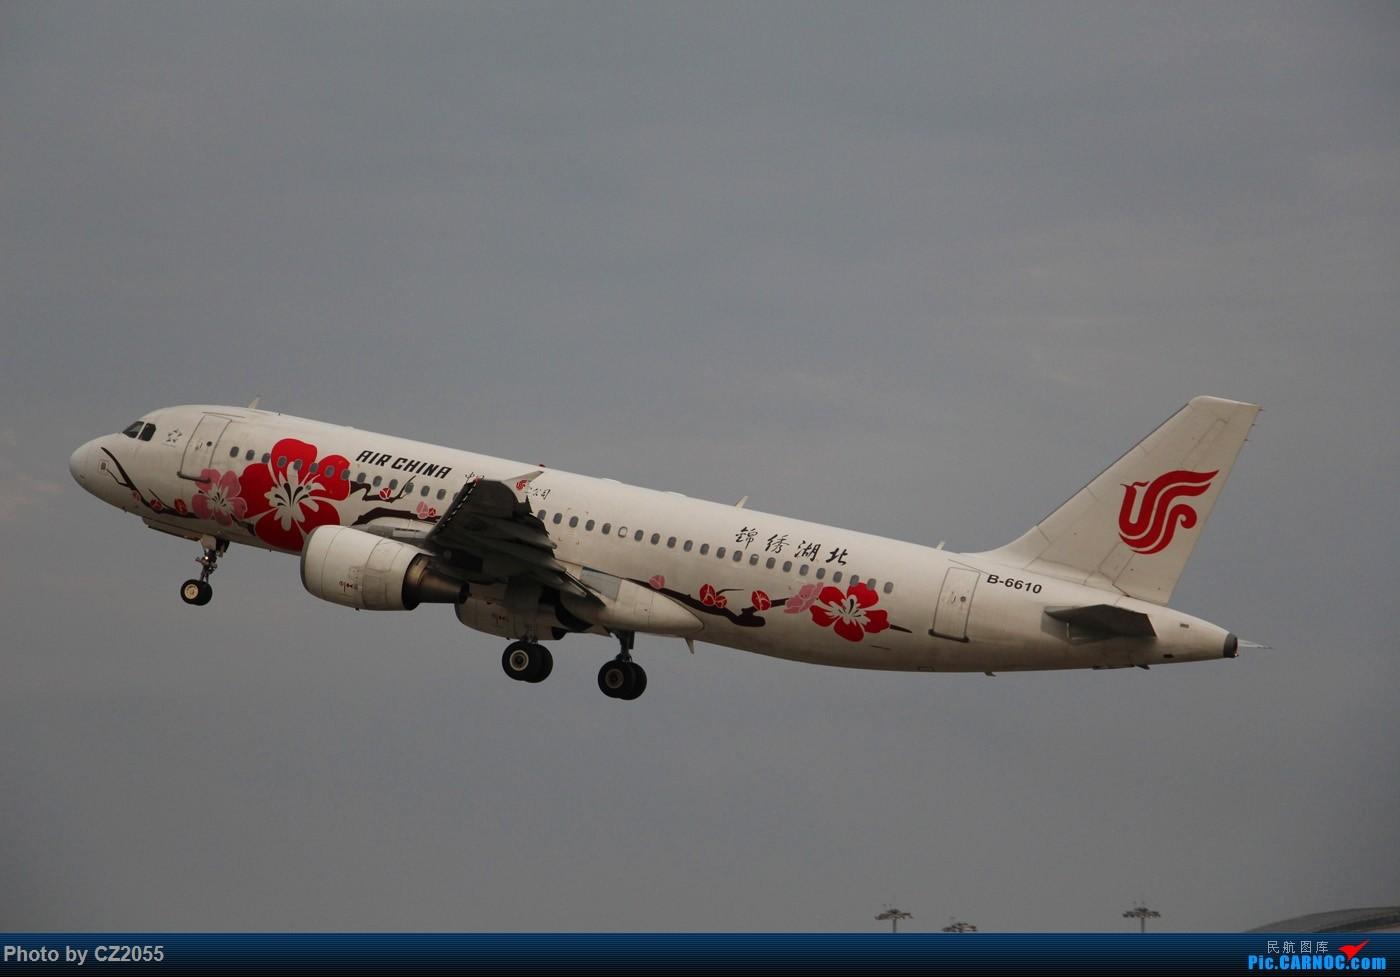 Re:[原创]Re:[原创]【广东青少年拍机小队】【C-Z-2055】一个下午的起起落落[25pics] 更新中... AIRBUS A320-200 B-6610 中国广州白云国际机场